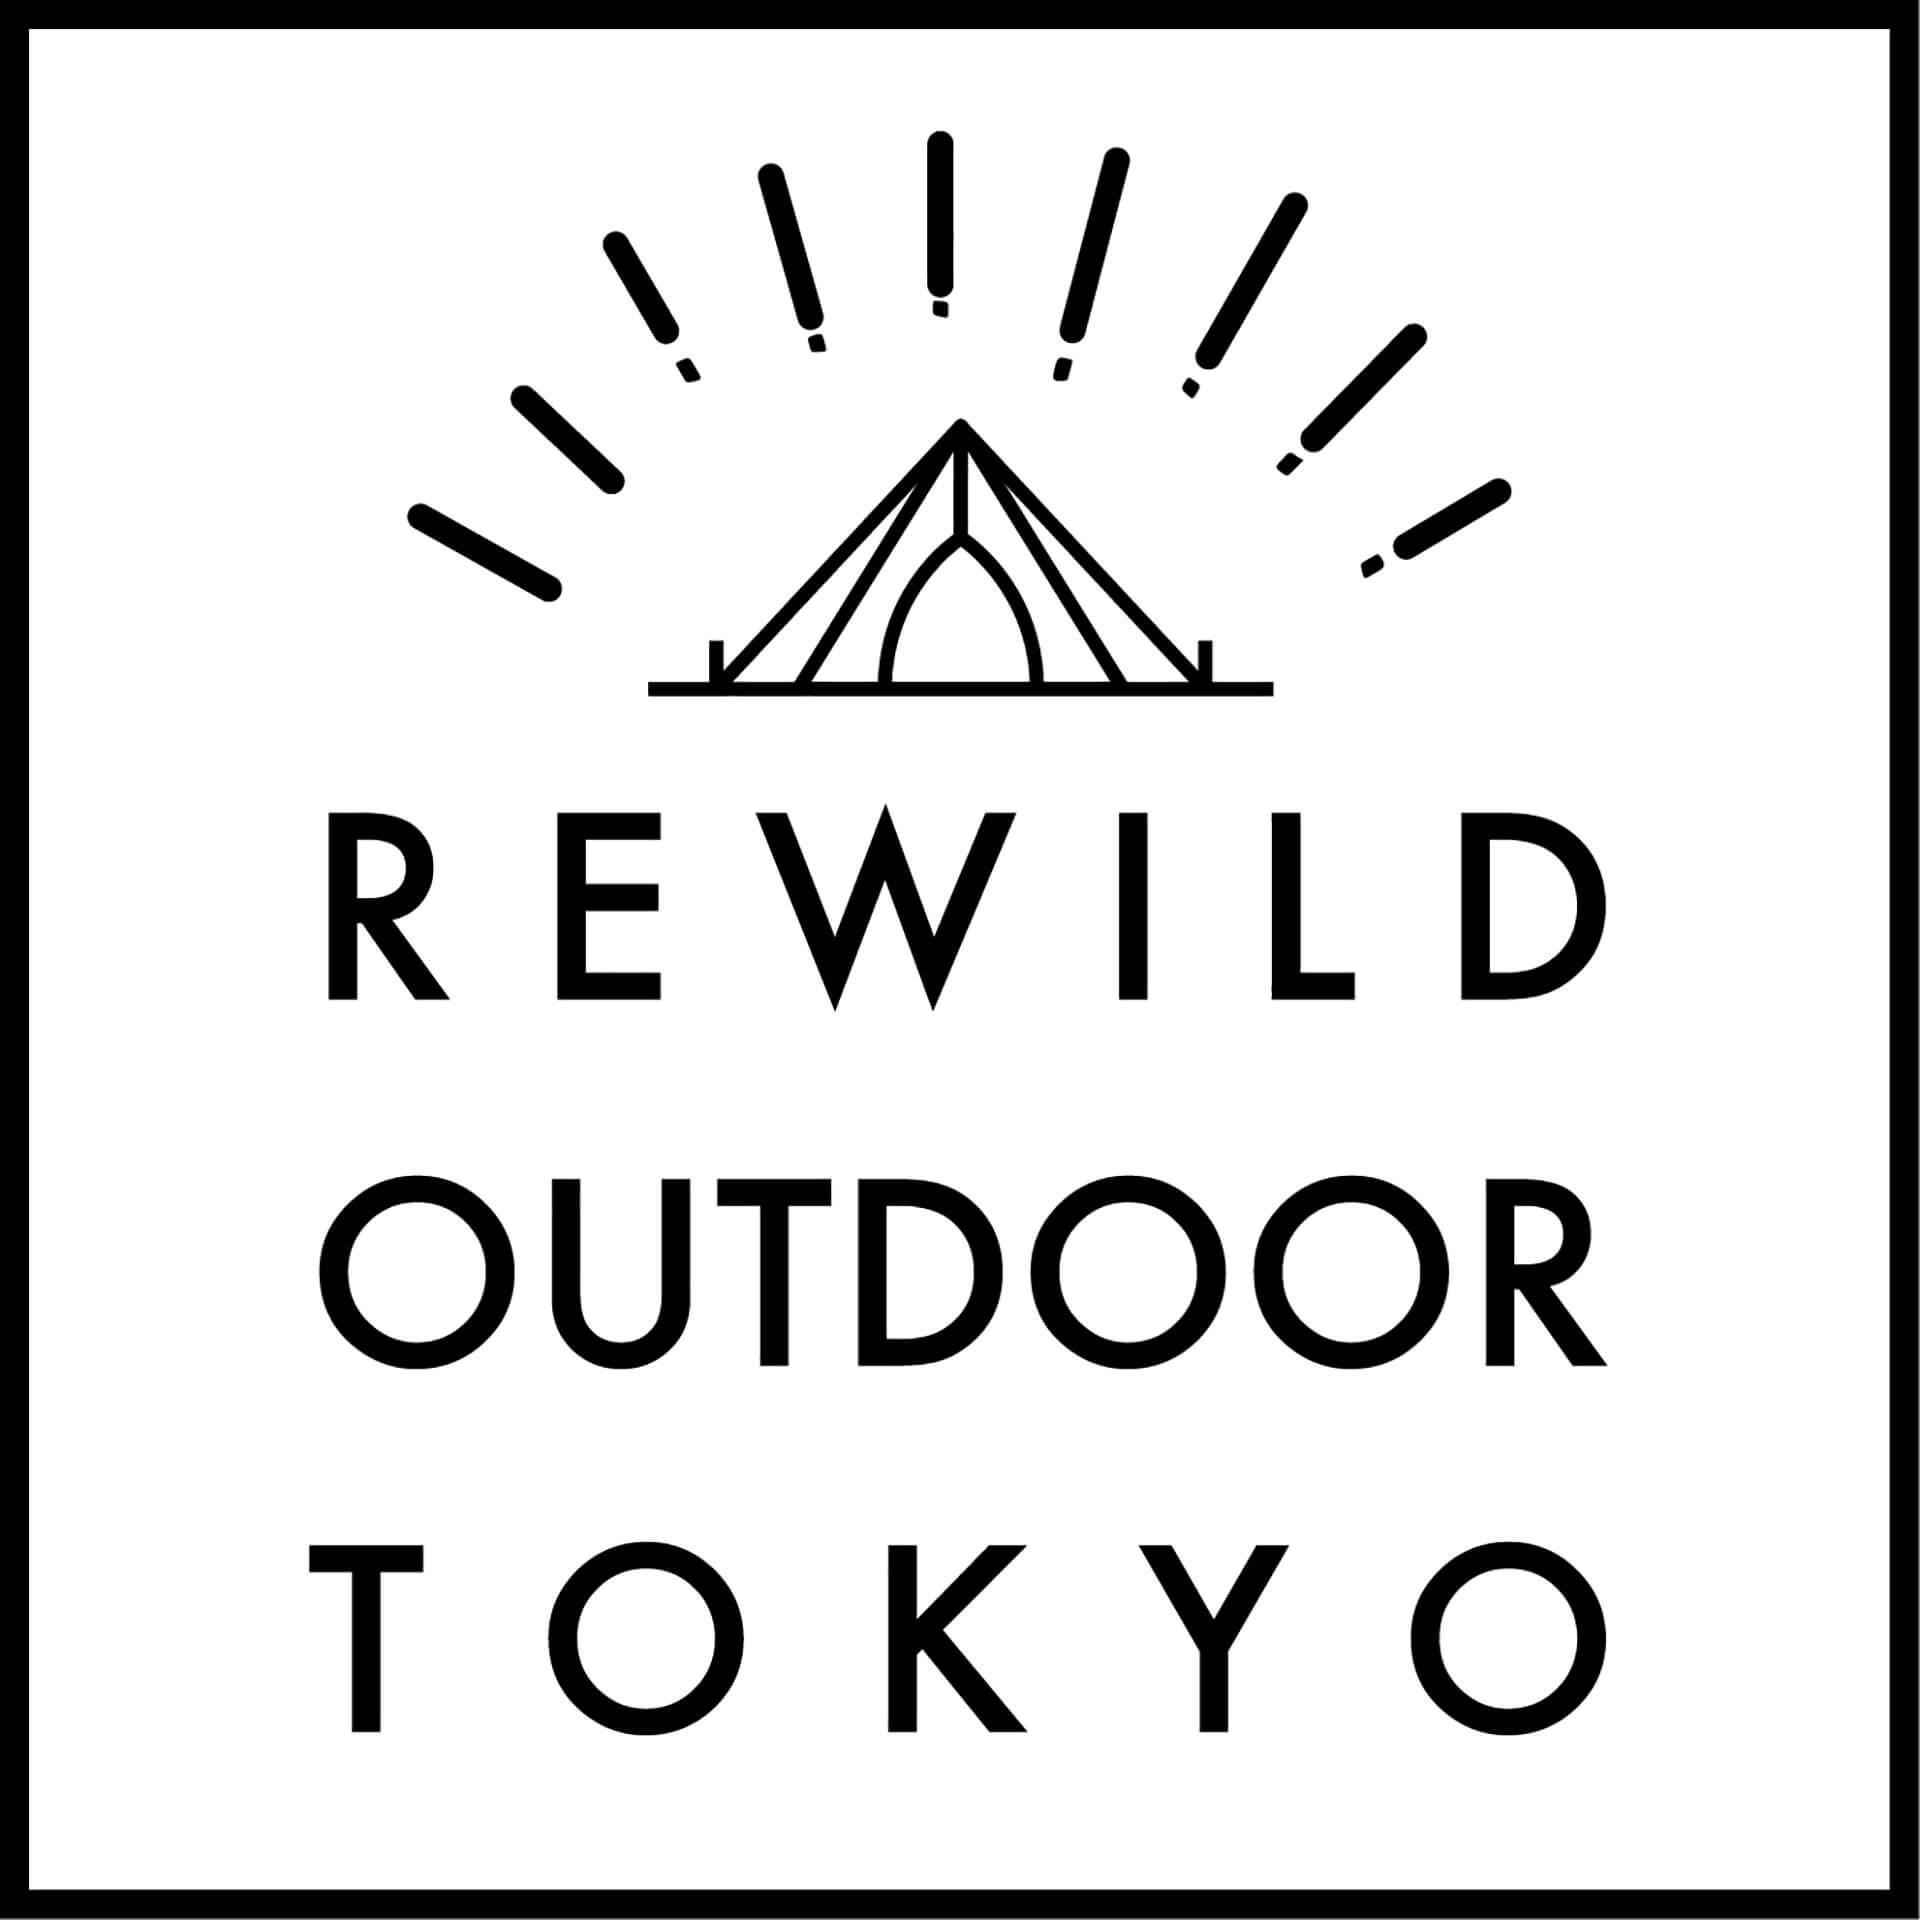 REWILD OUTDOOR TOKYO